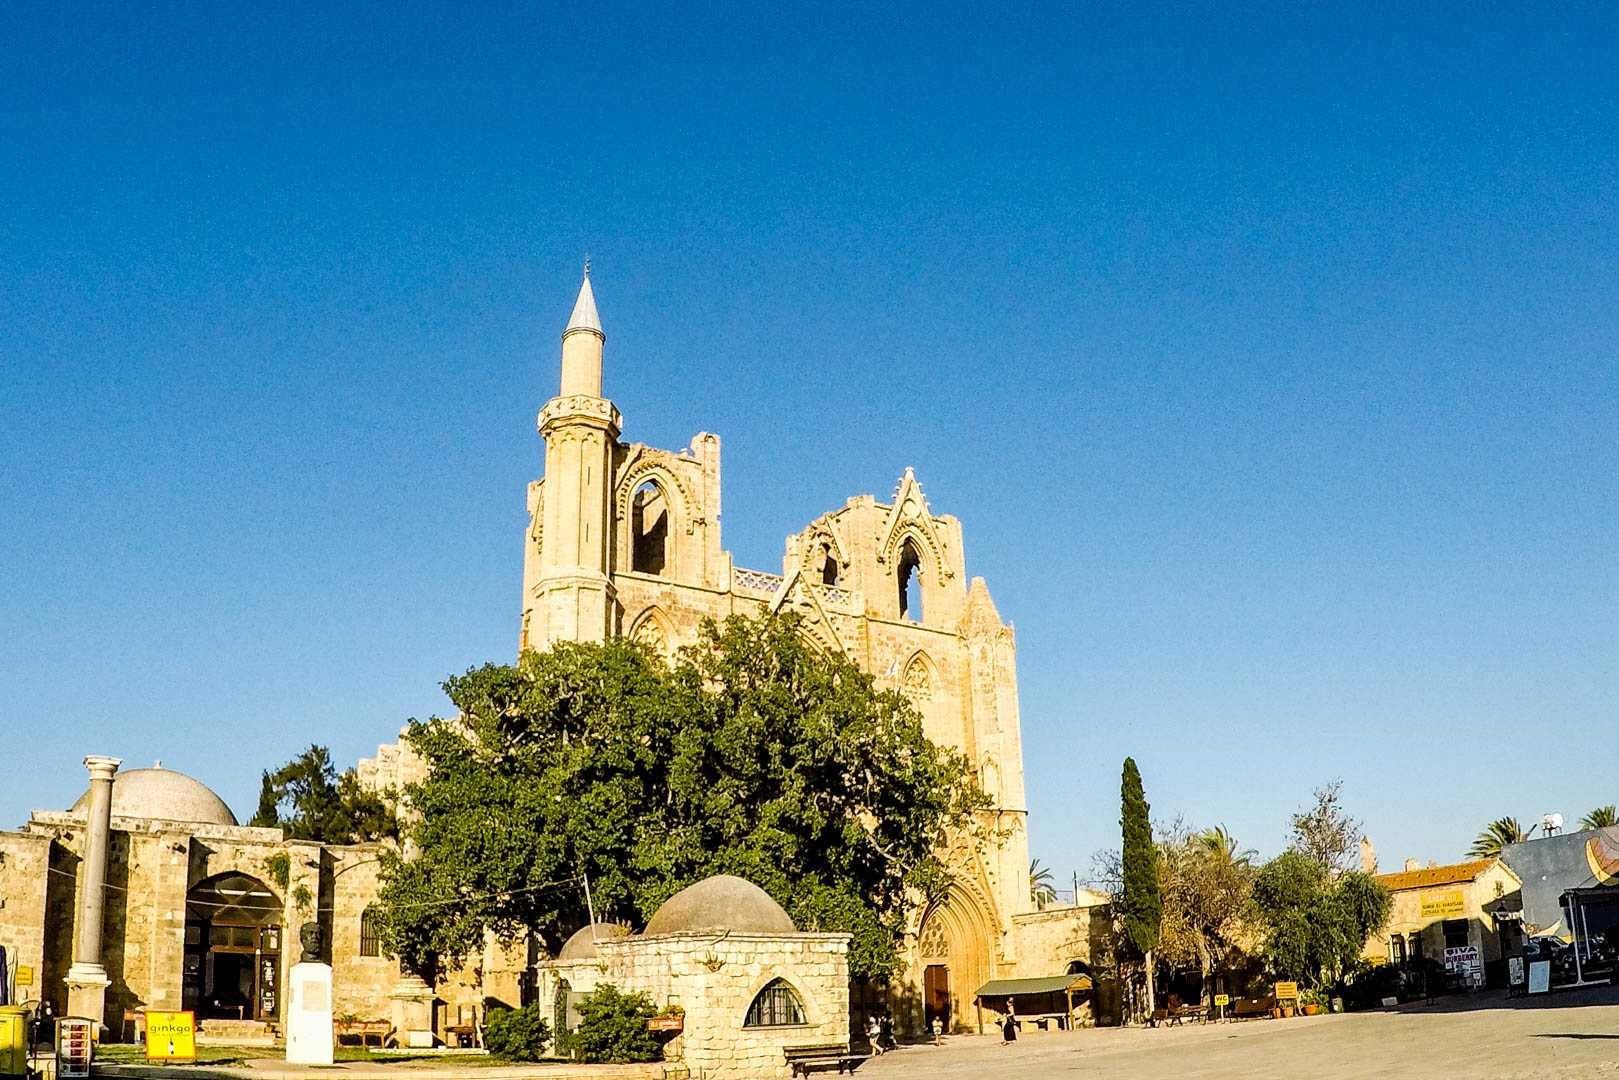 Northern Cyprus - Kuzey Kıbrıs - Lala Mustafa Paşa